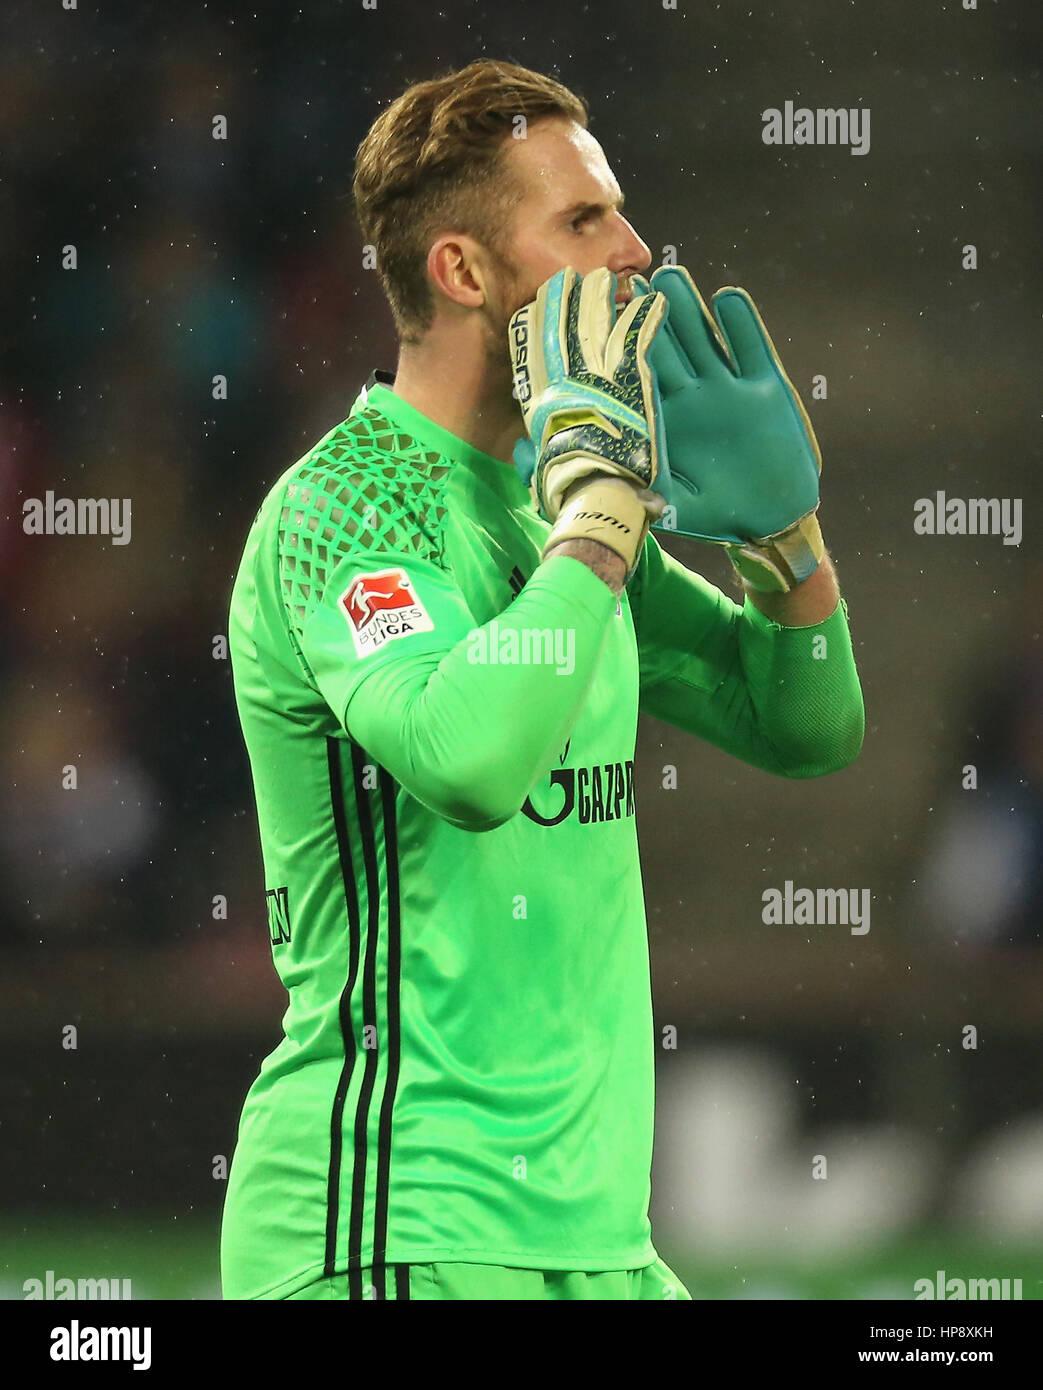 Cologne, Germany, February 19, 2017, Bundesliga matchday 21, 1. FC Koeln - FC Schalke 04:  Goalkeeper Ralf Faehrmann - Stock Image